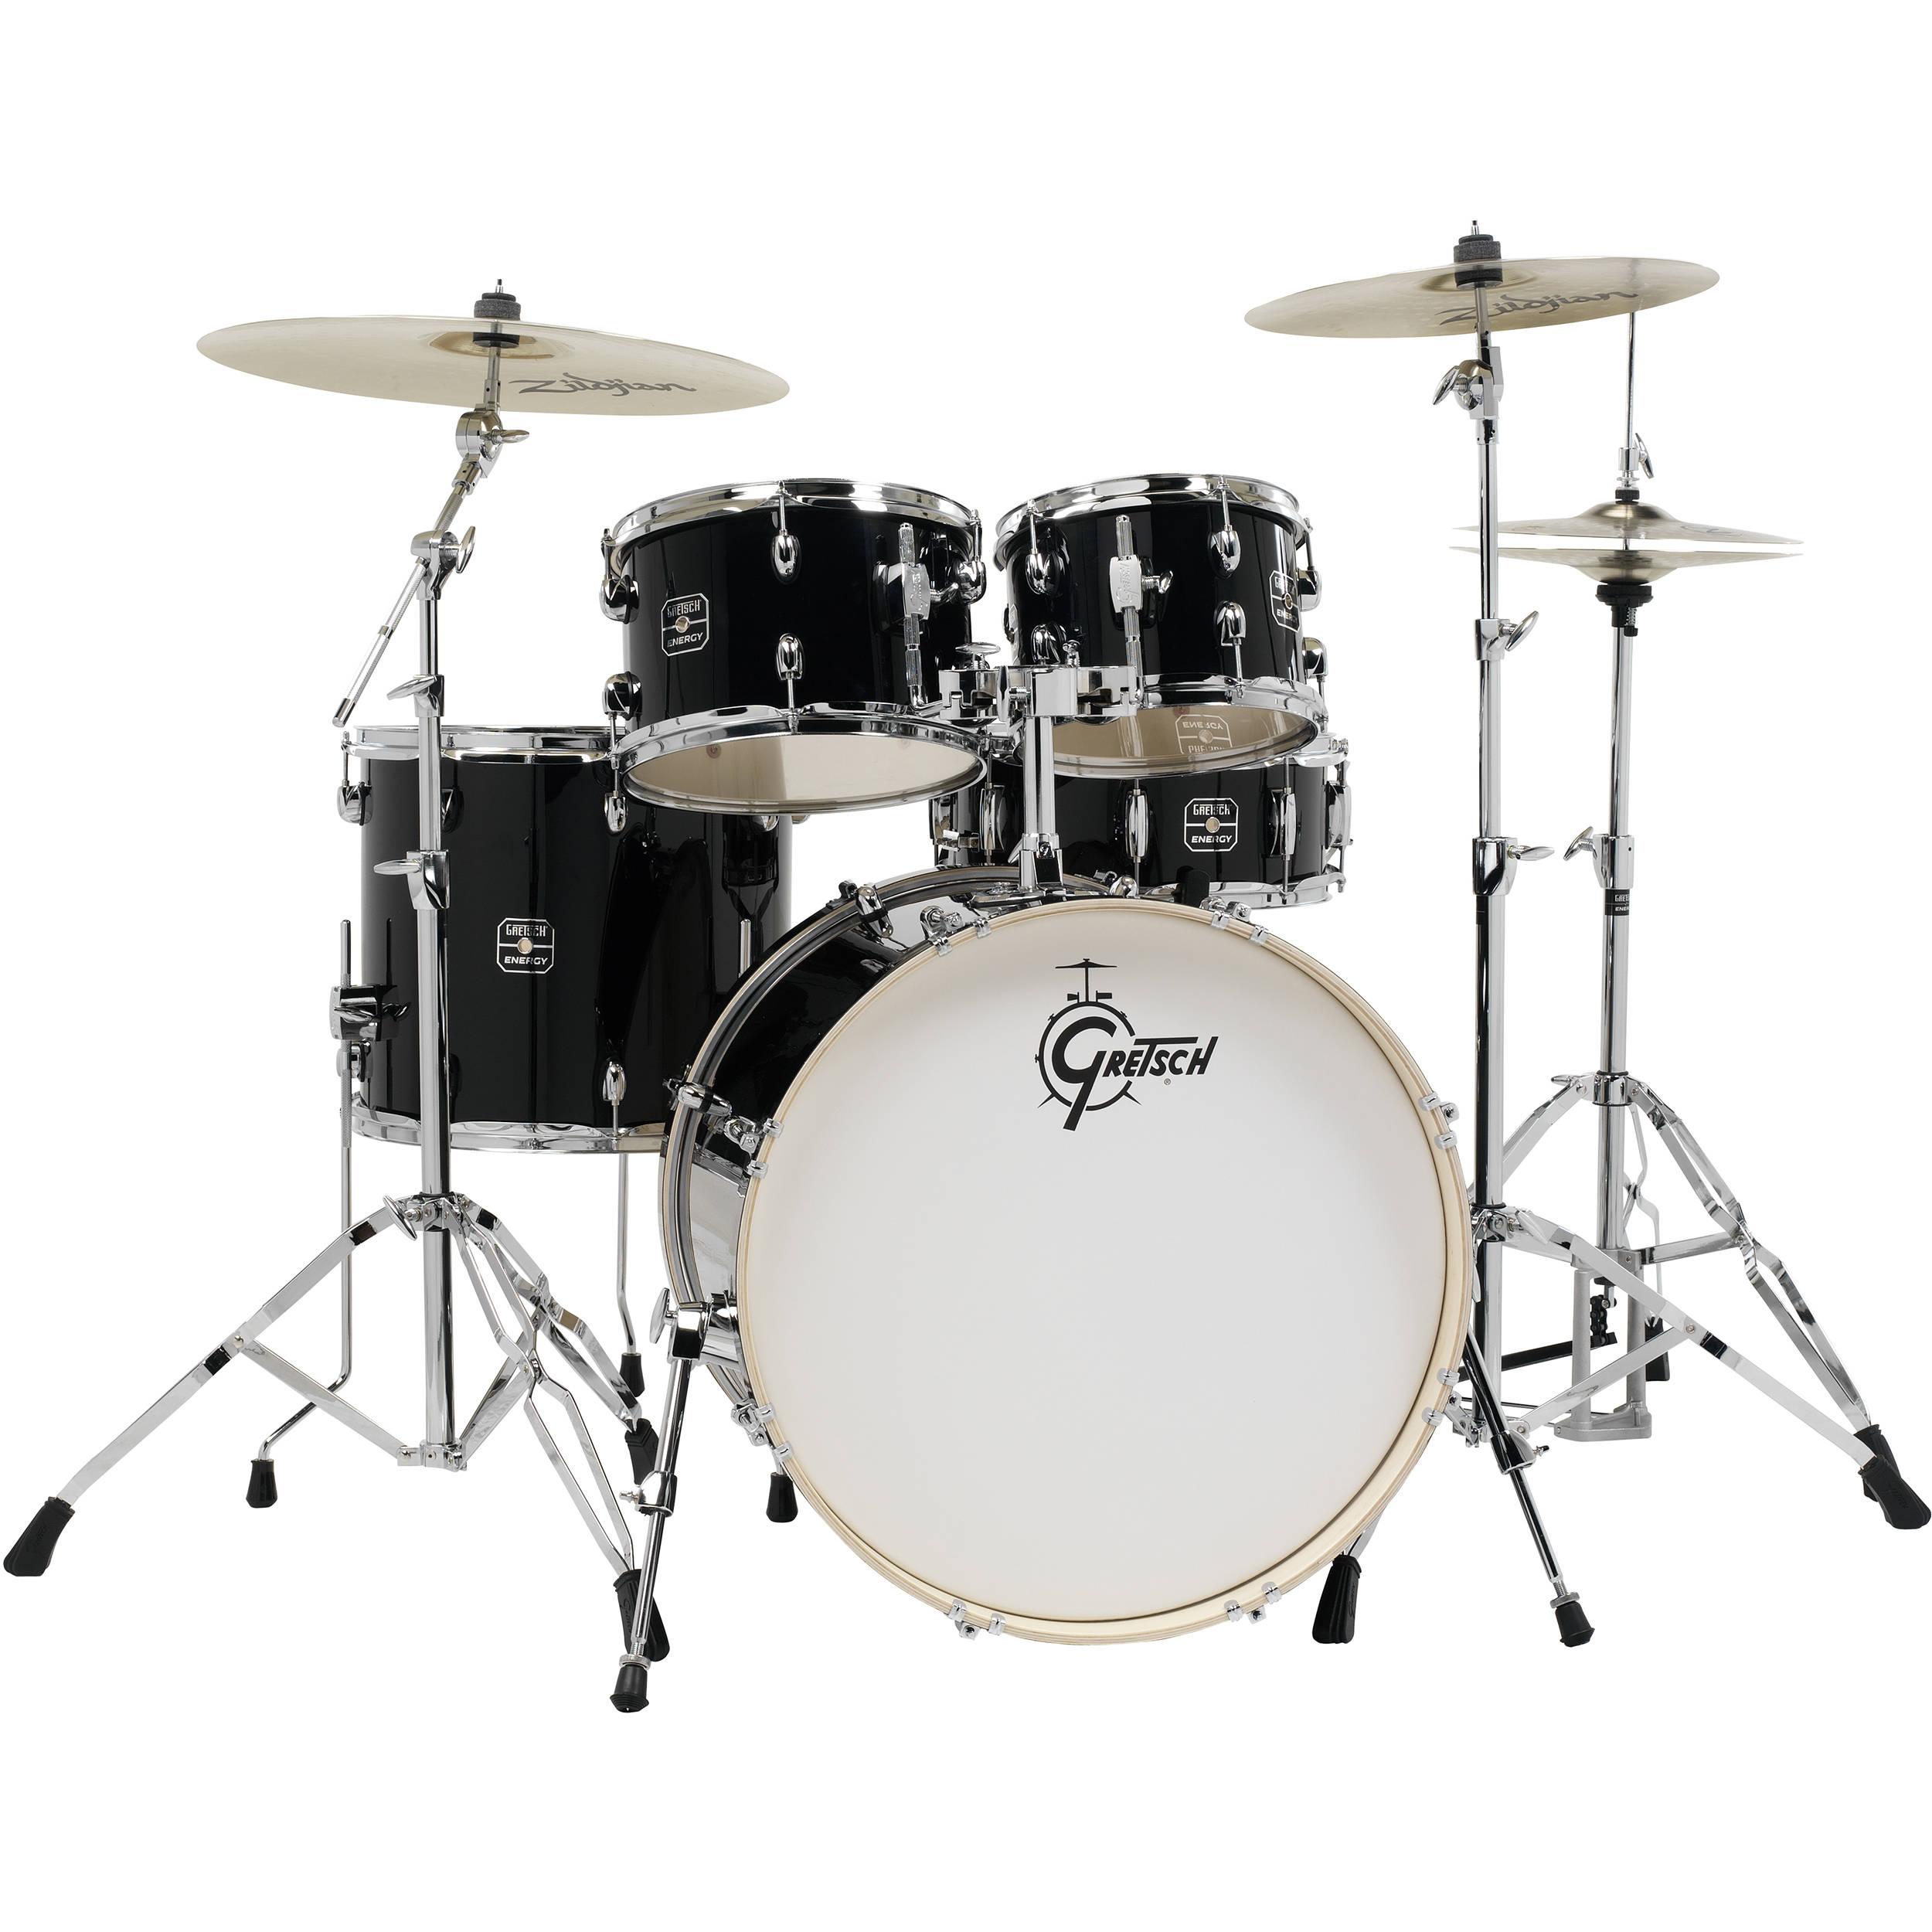 gretsch drums energy series 5 piece drum set ge4e825zb b h photo. Black Bedroom Furniture Sets. Home Design Ideas